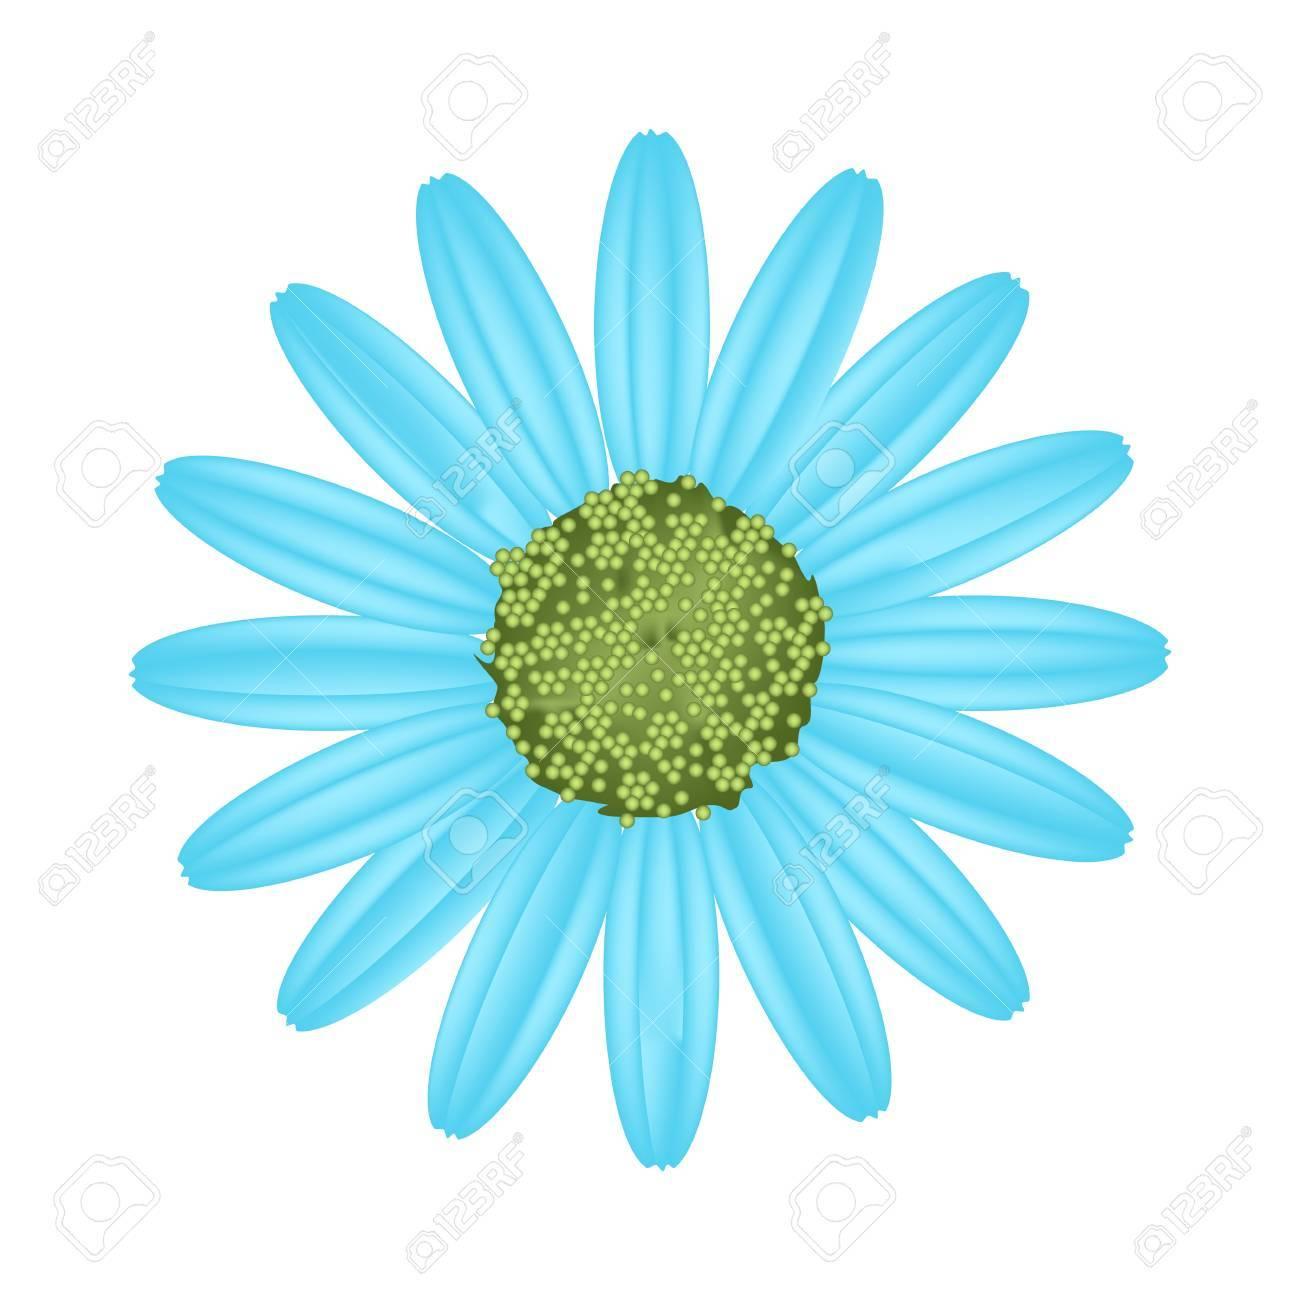 Symbol Of Love Bright And Light Blue Osteospermum Daisy Flower